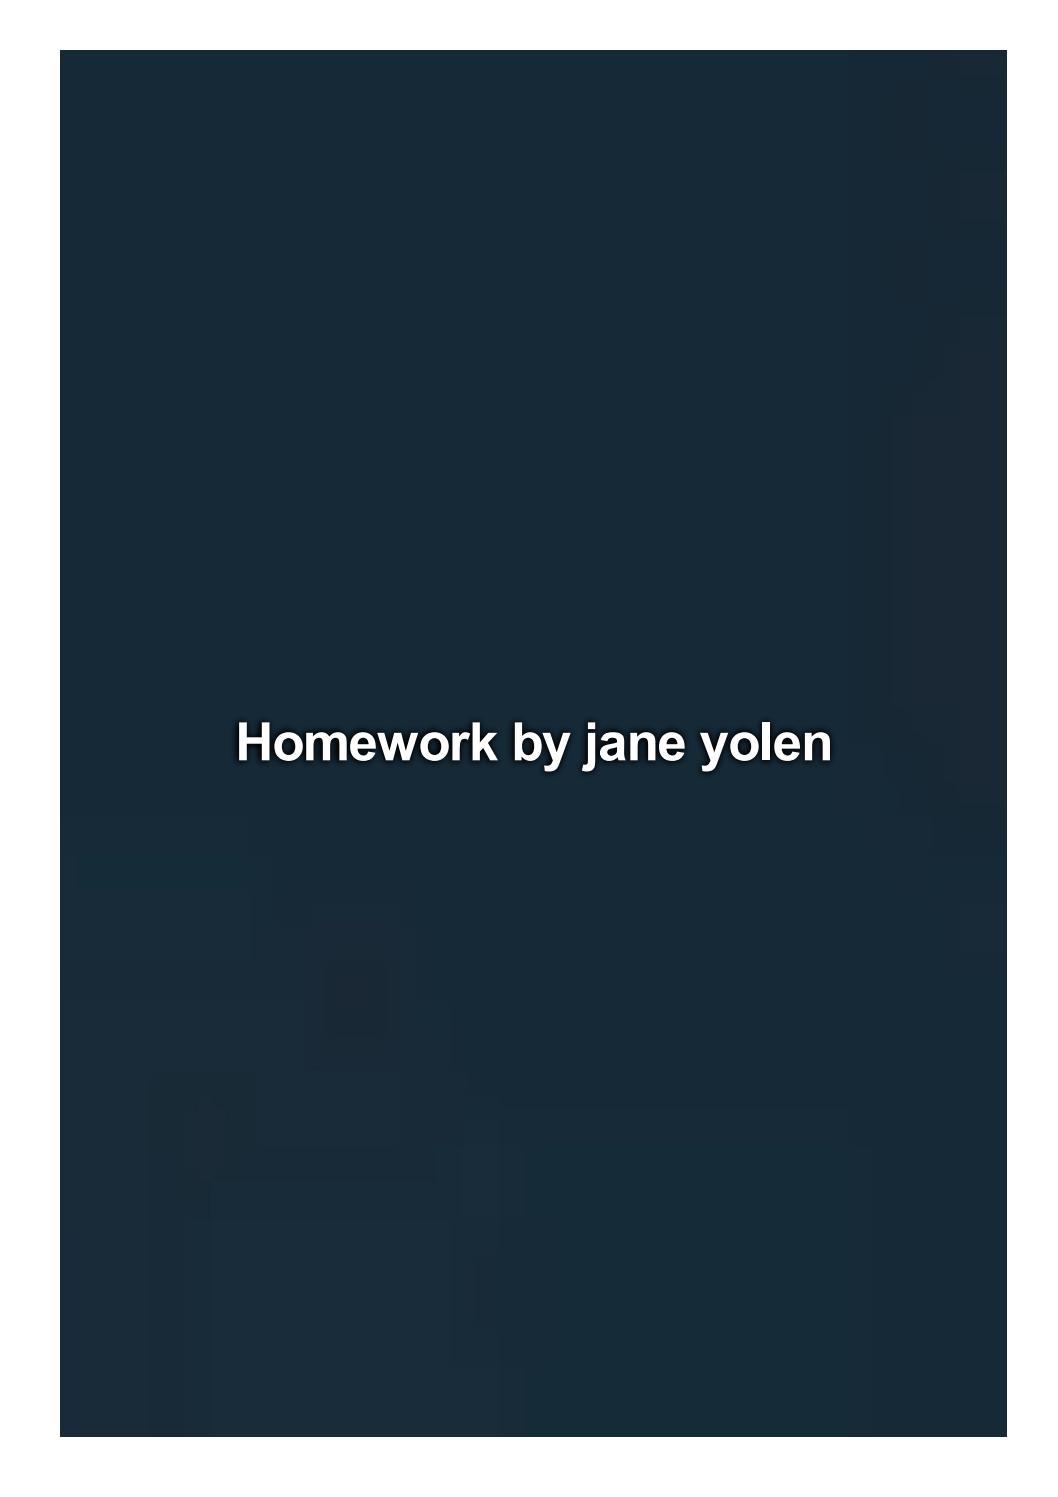 Homework jane yolen ford foundation fellowship dissertation